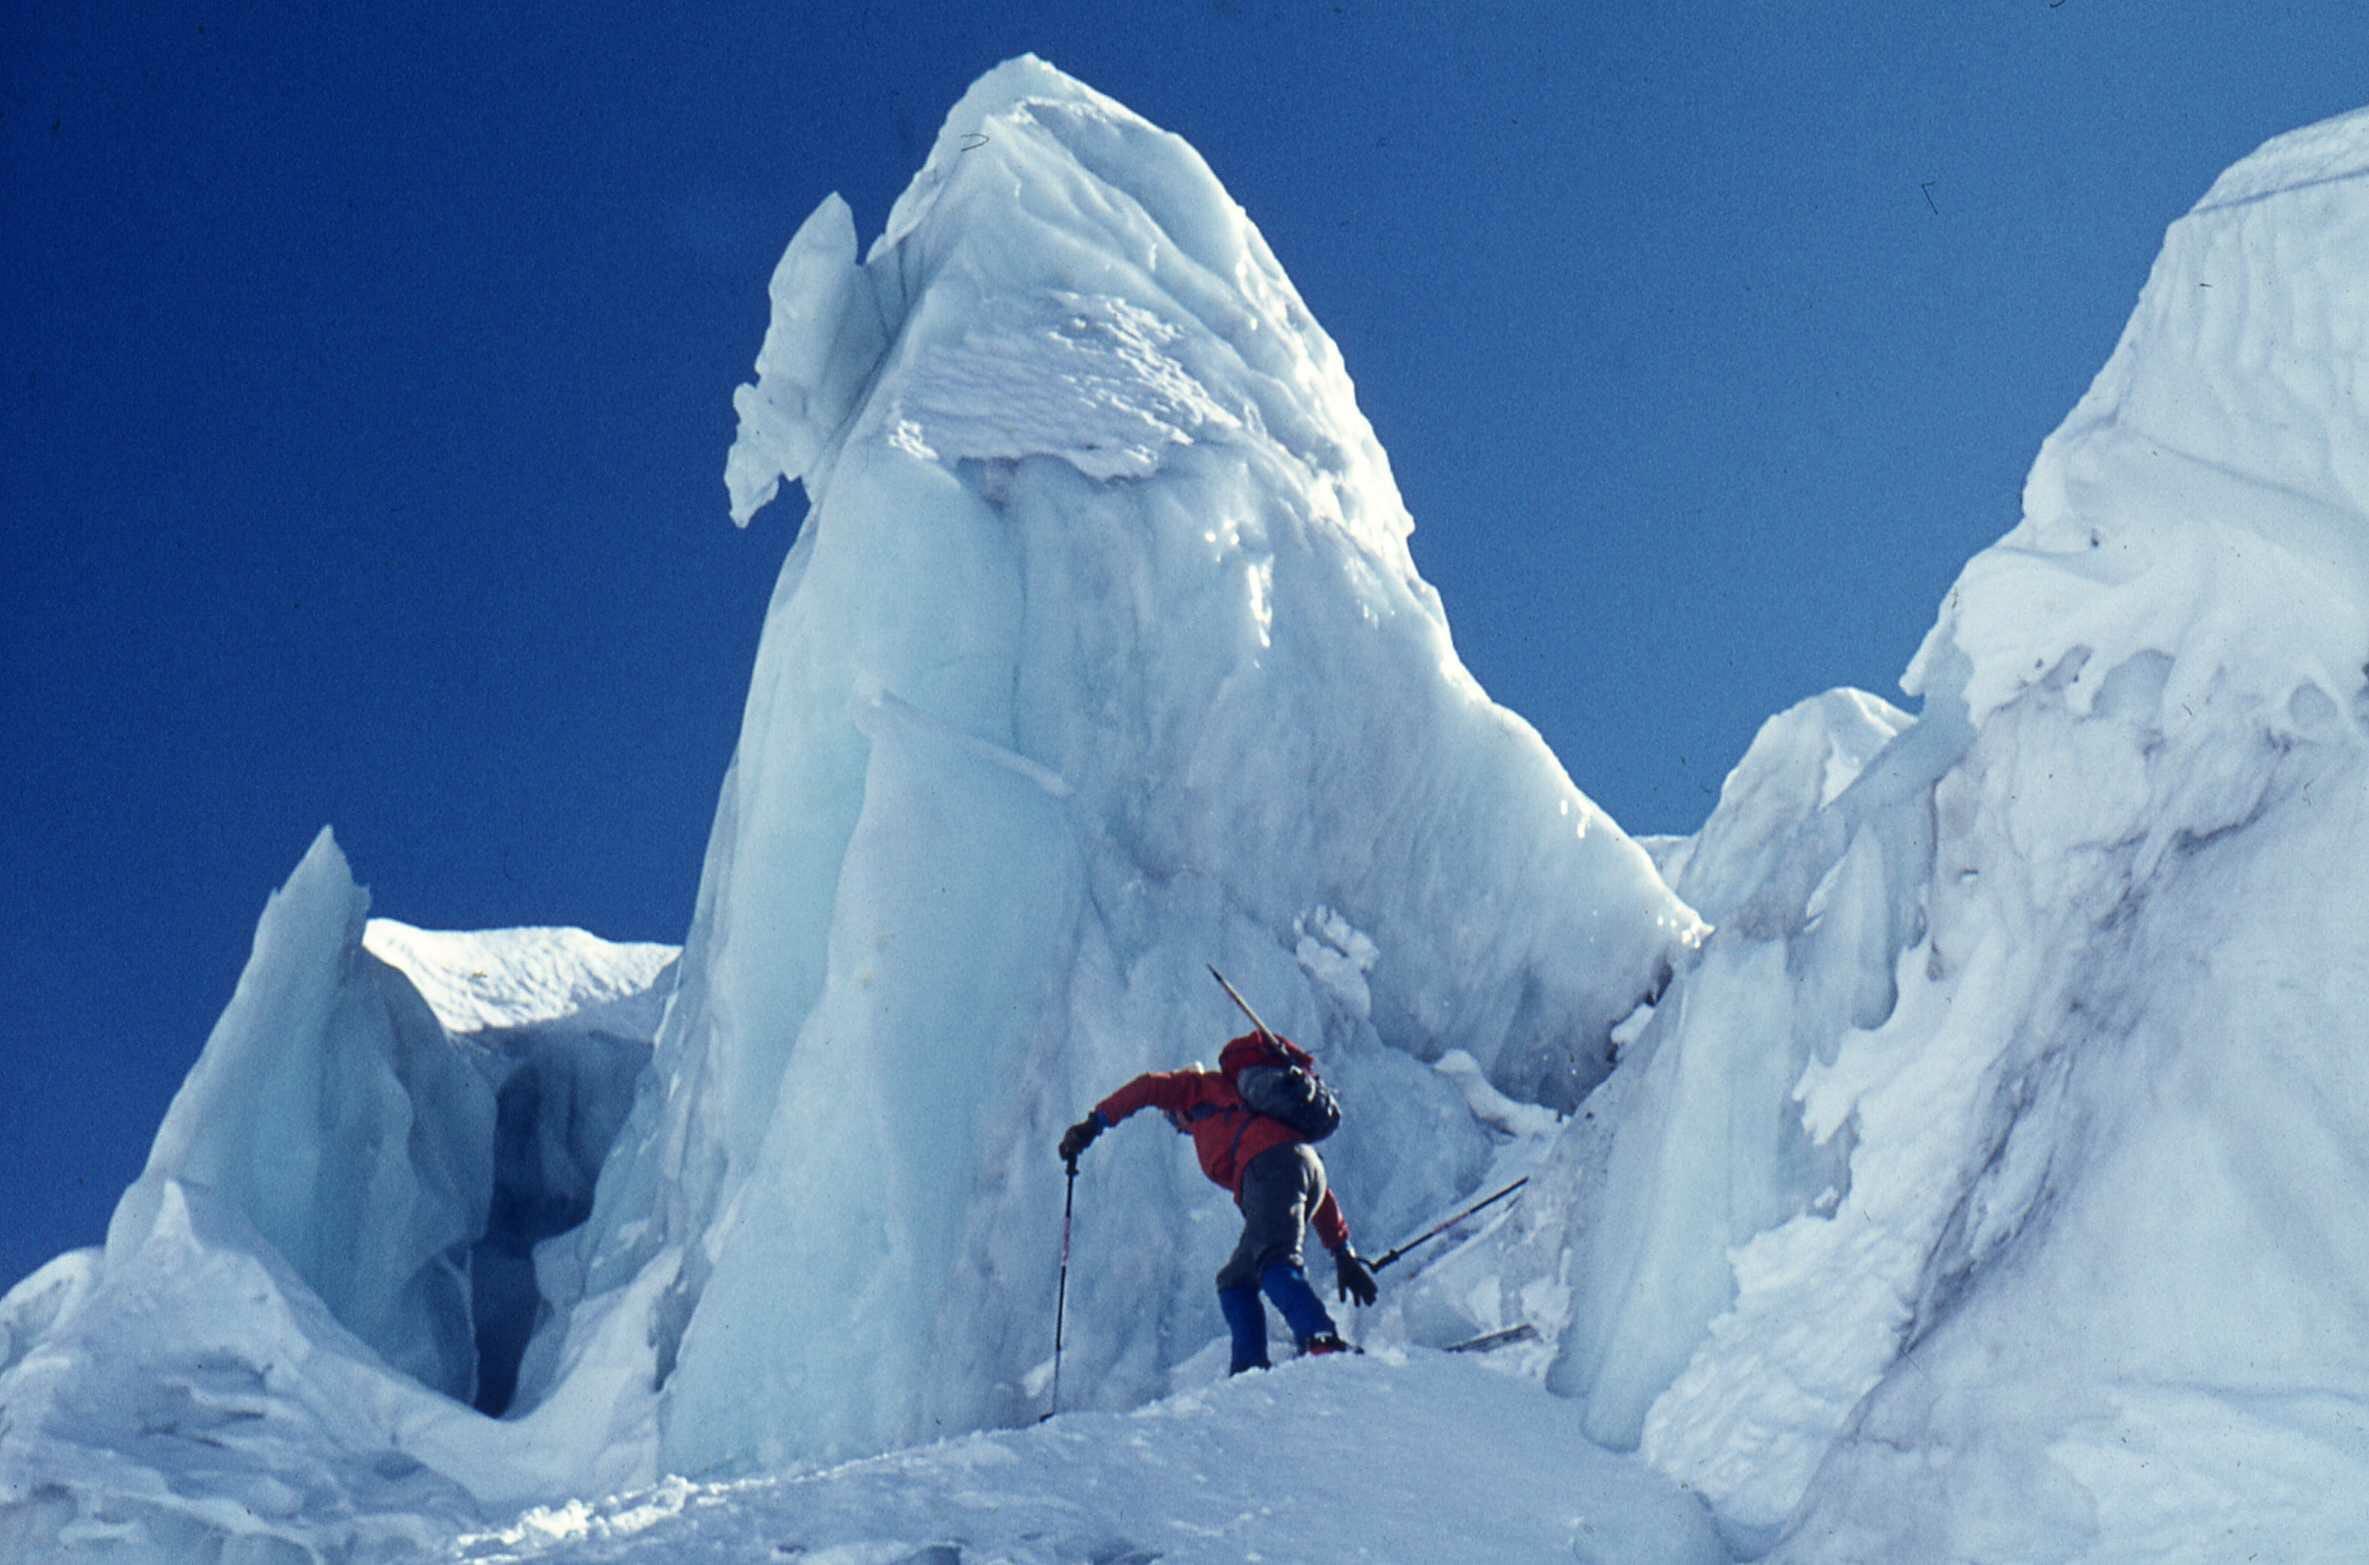 Mer de glace verso Chamonix